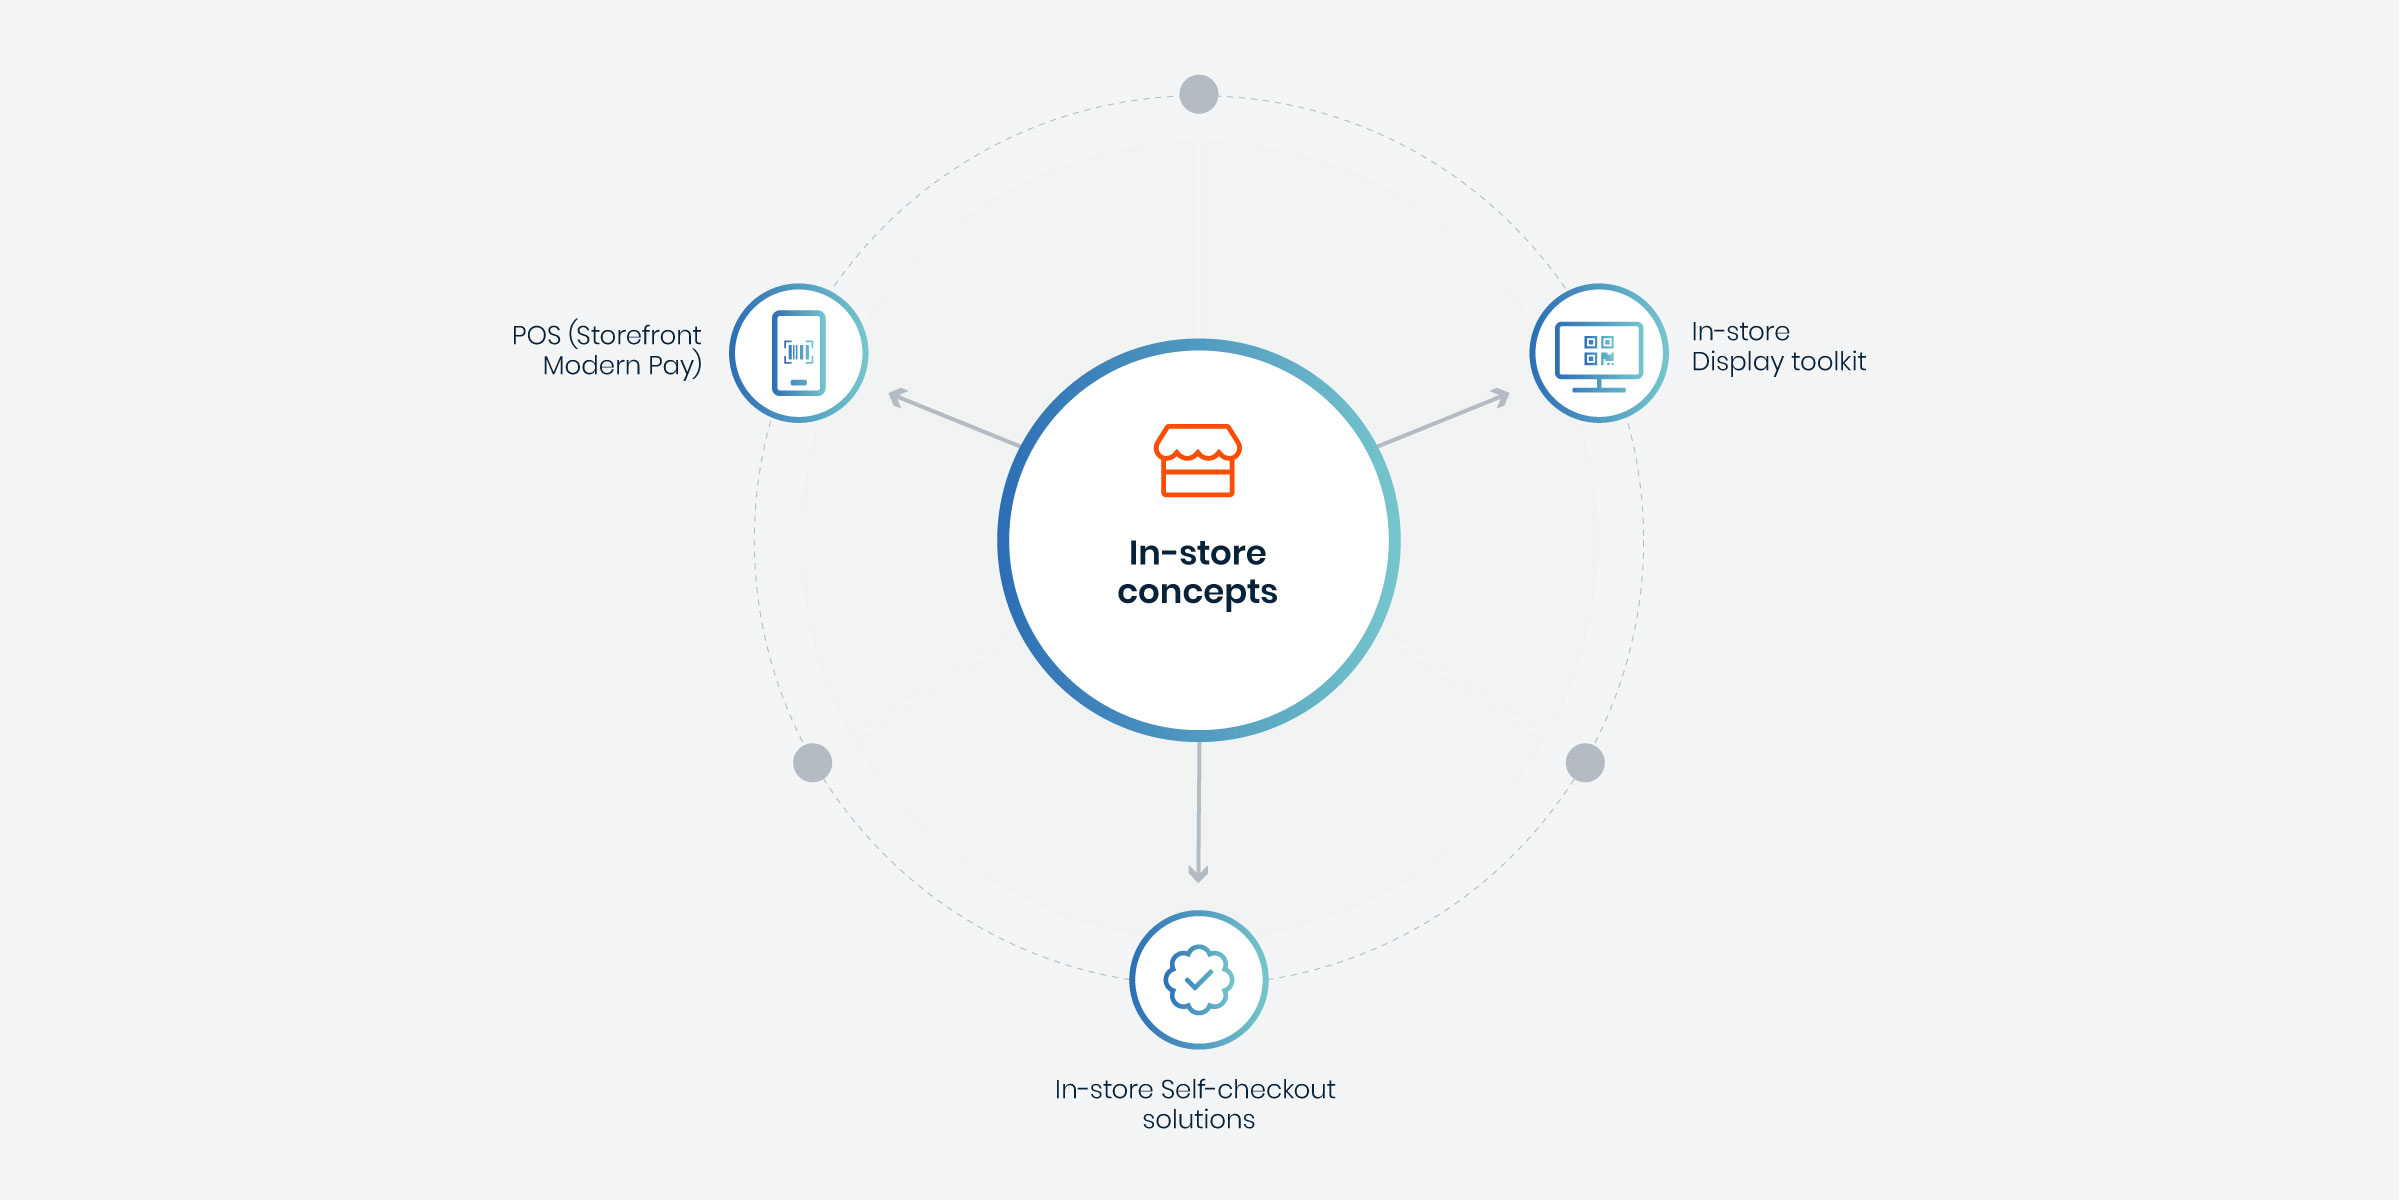 @2x_Instore-concepts